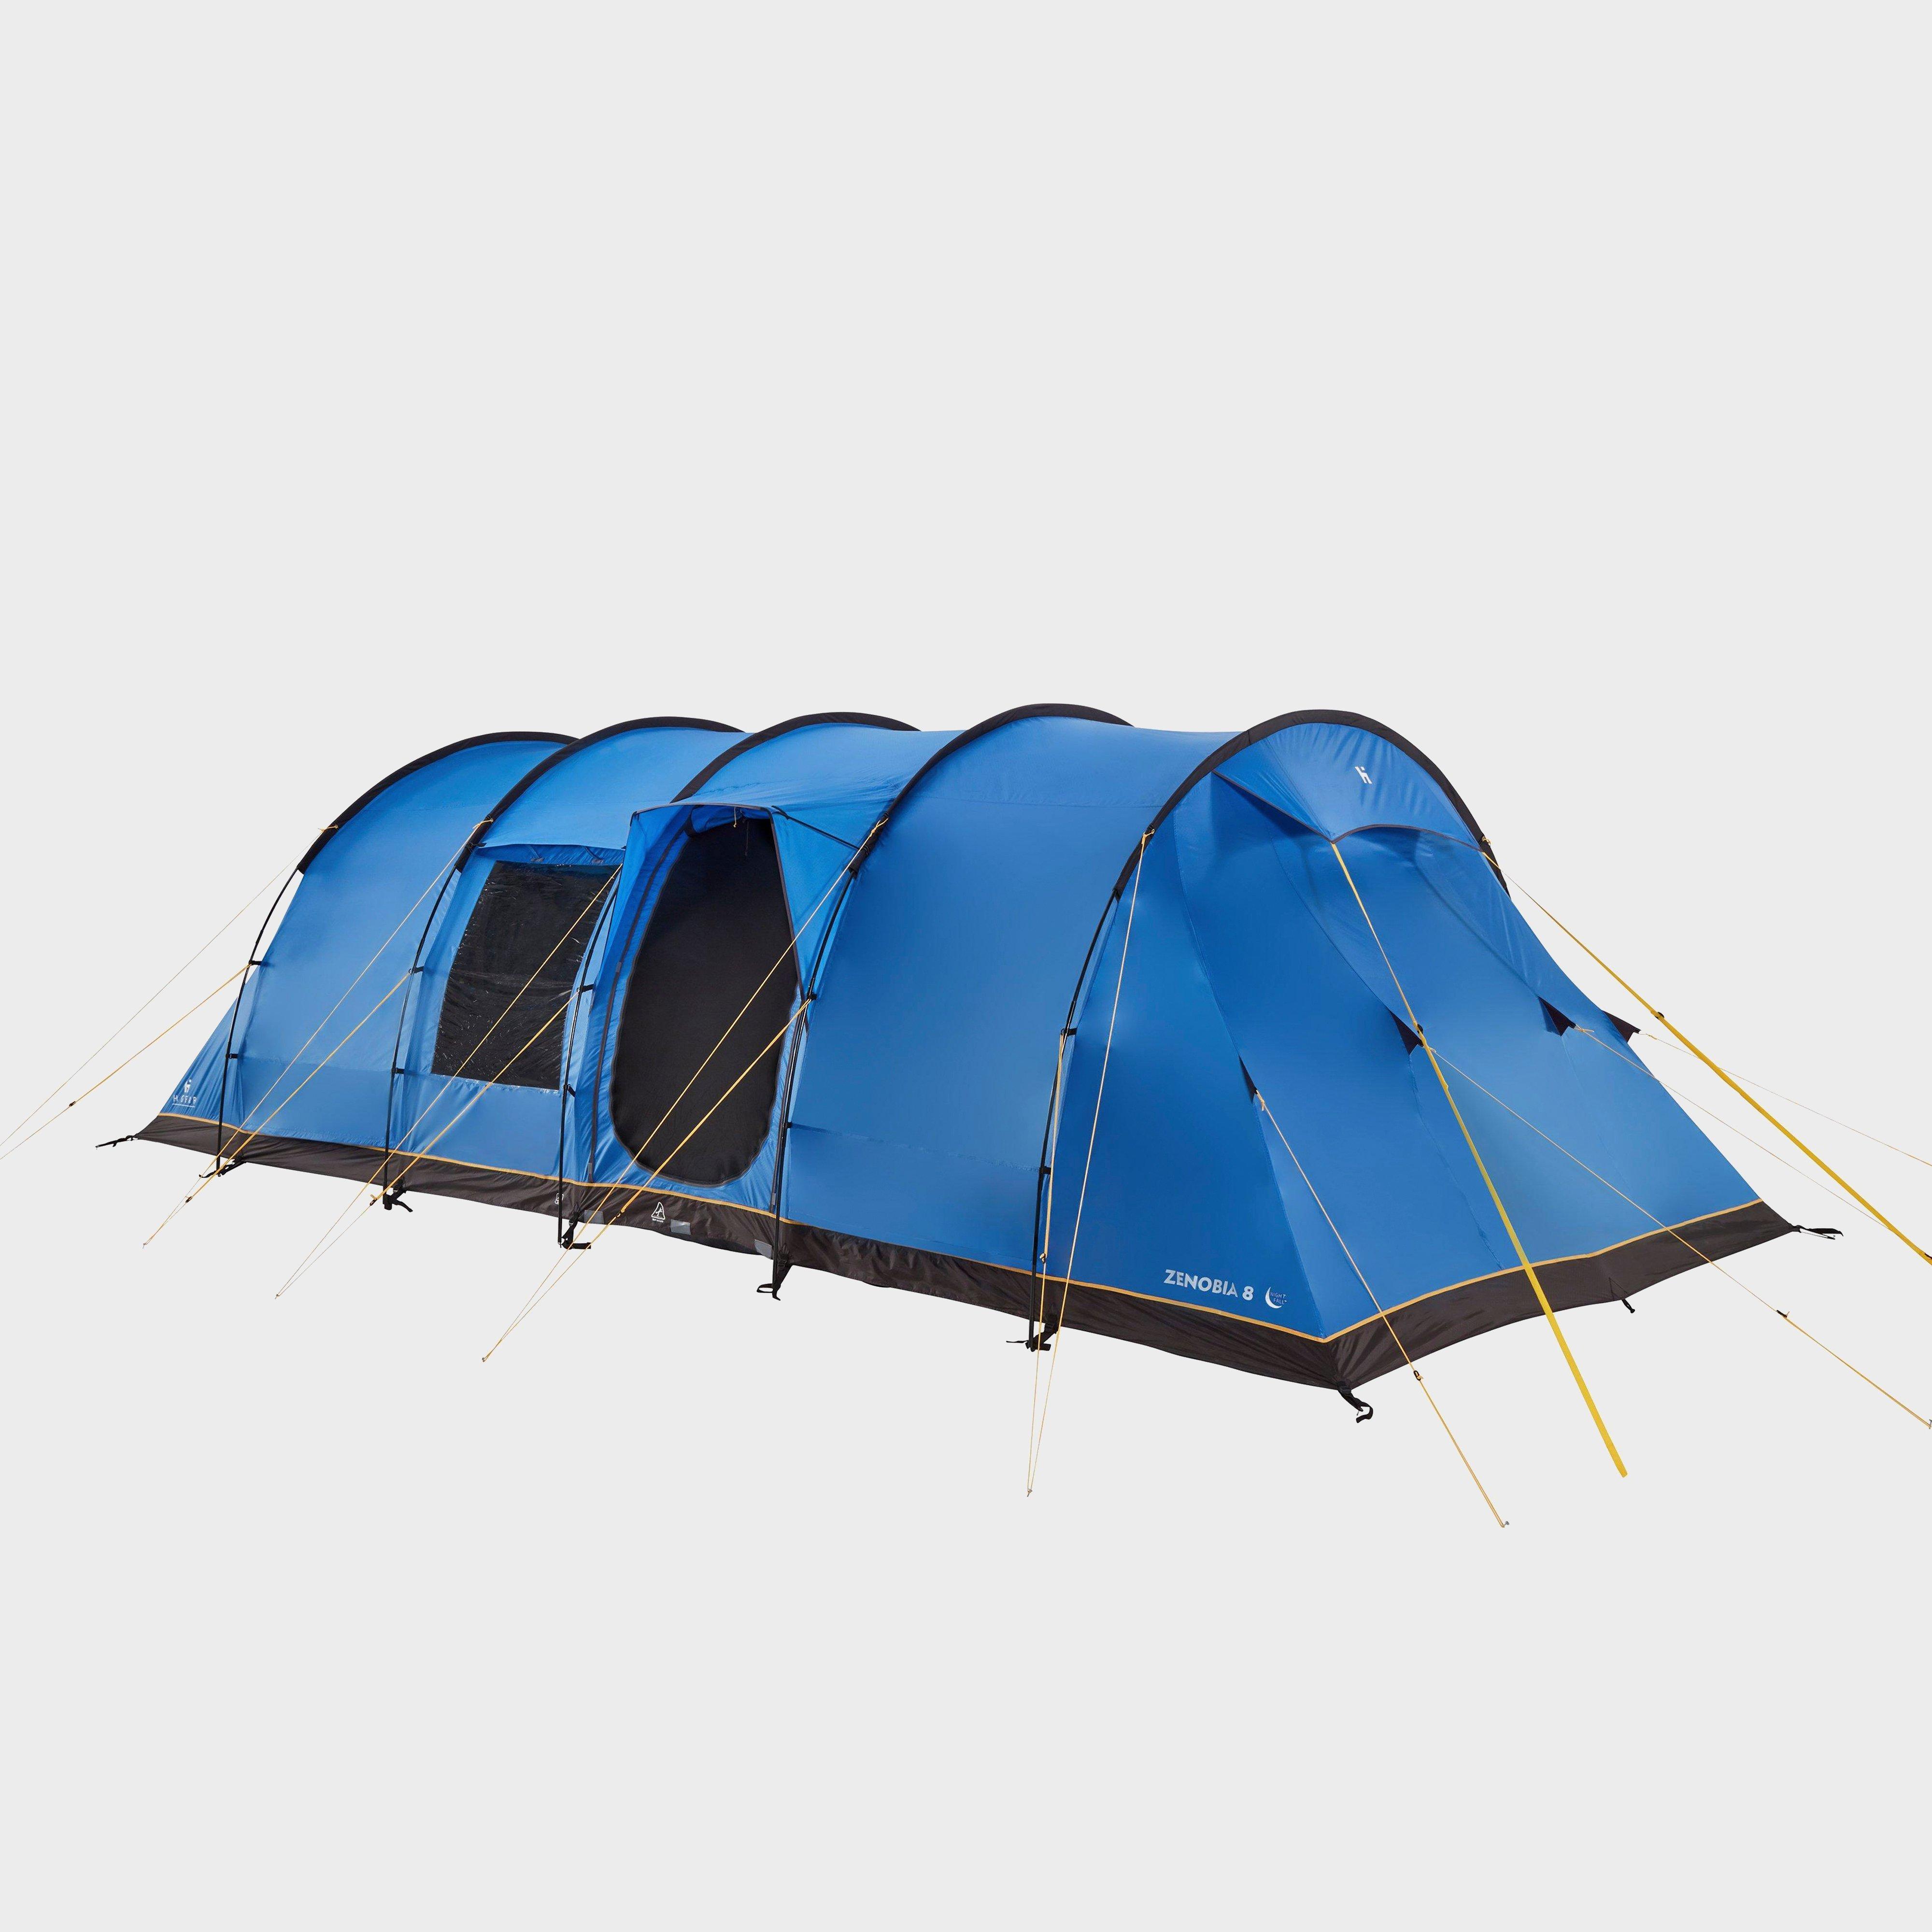 Hi-gear Zenobia 8 Nightfall Tent - Blue/blue  Blue/blue